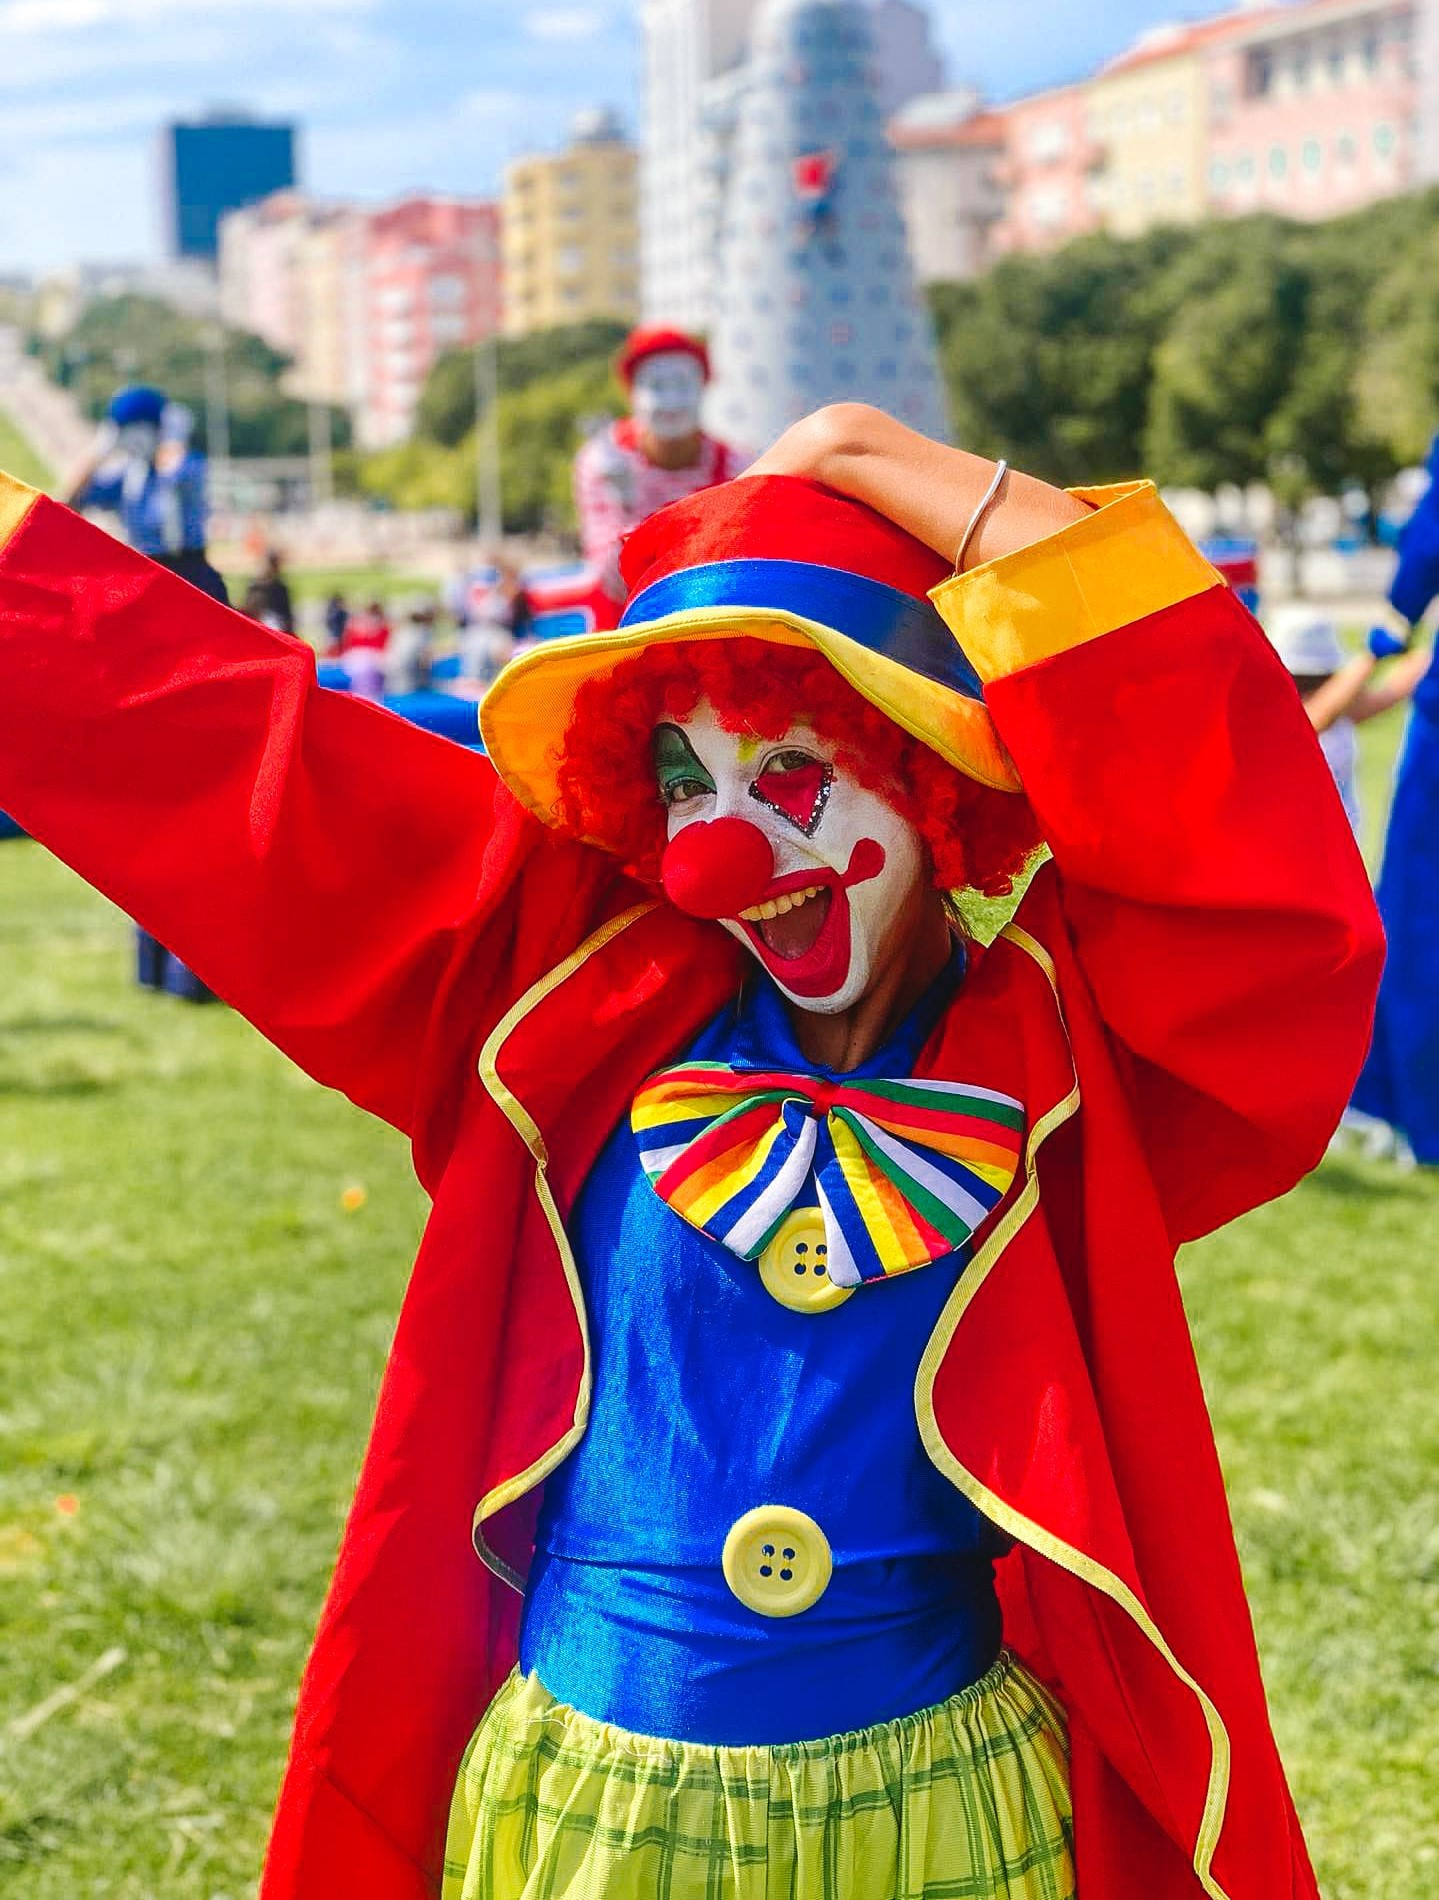 Palhaços - Clowning